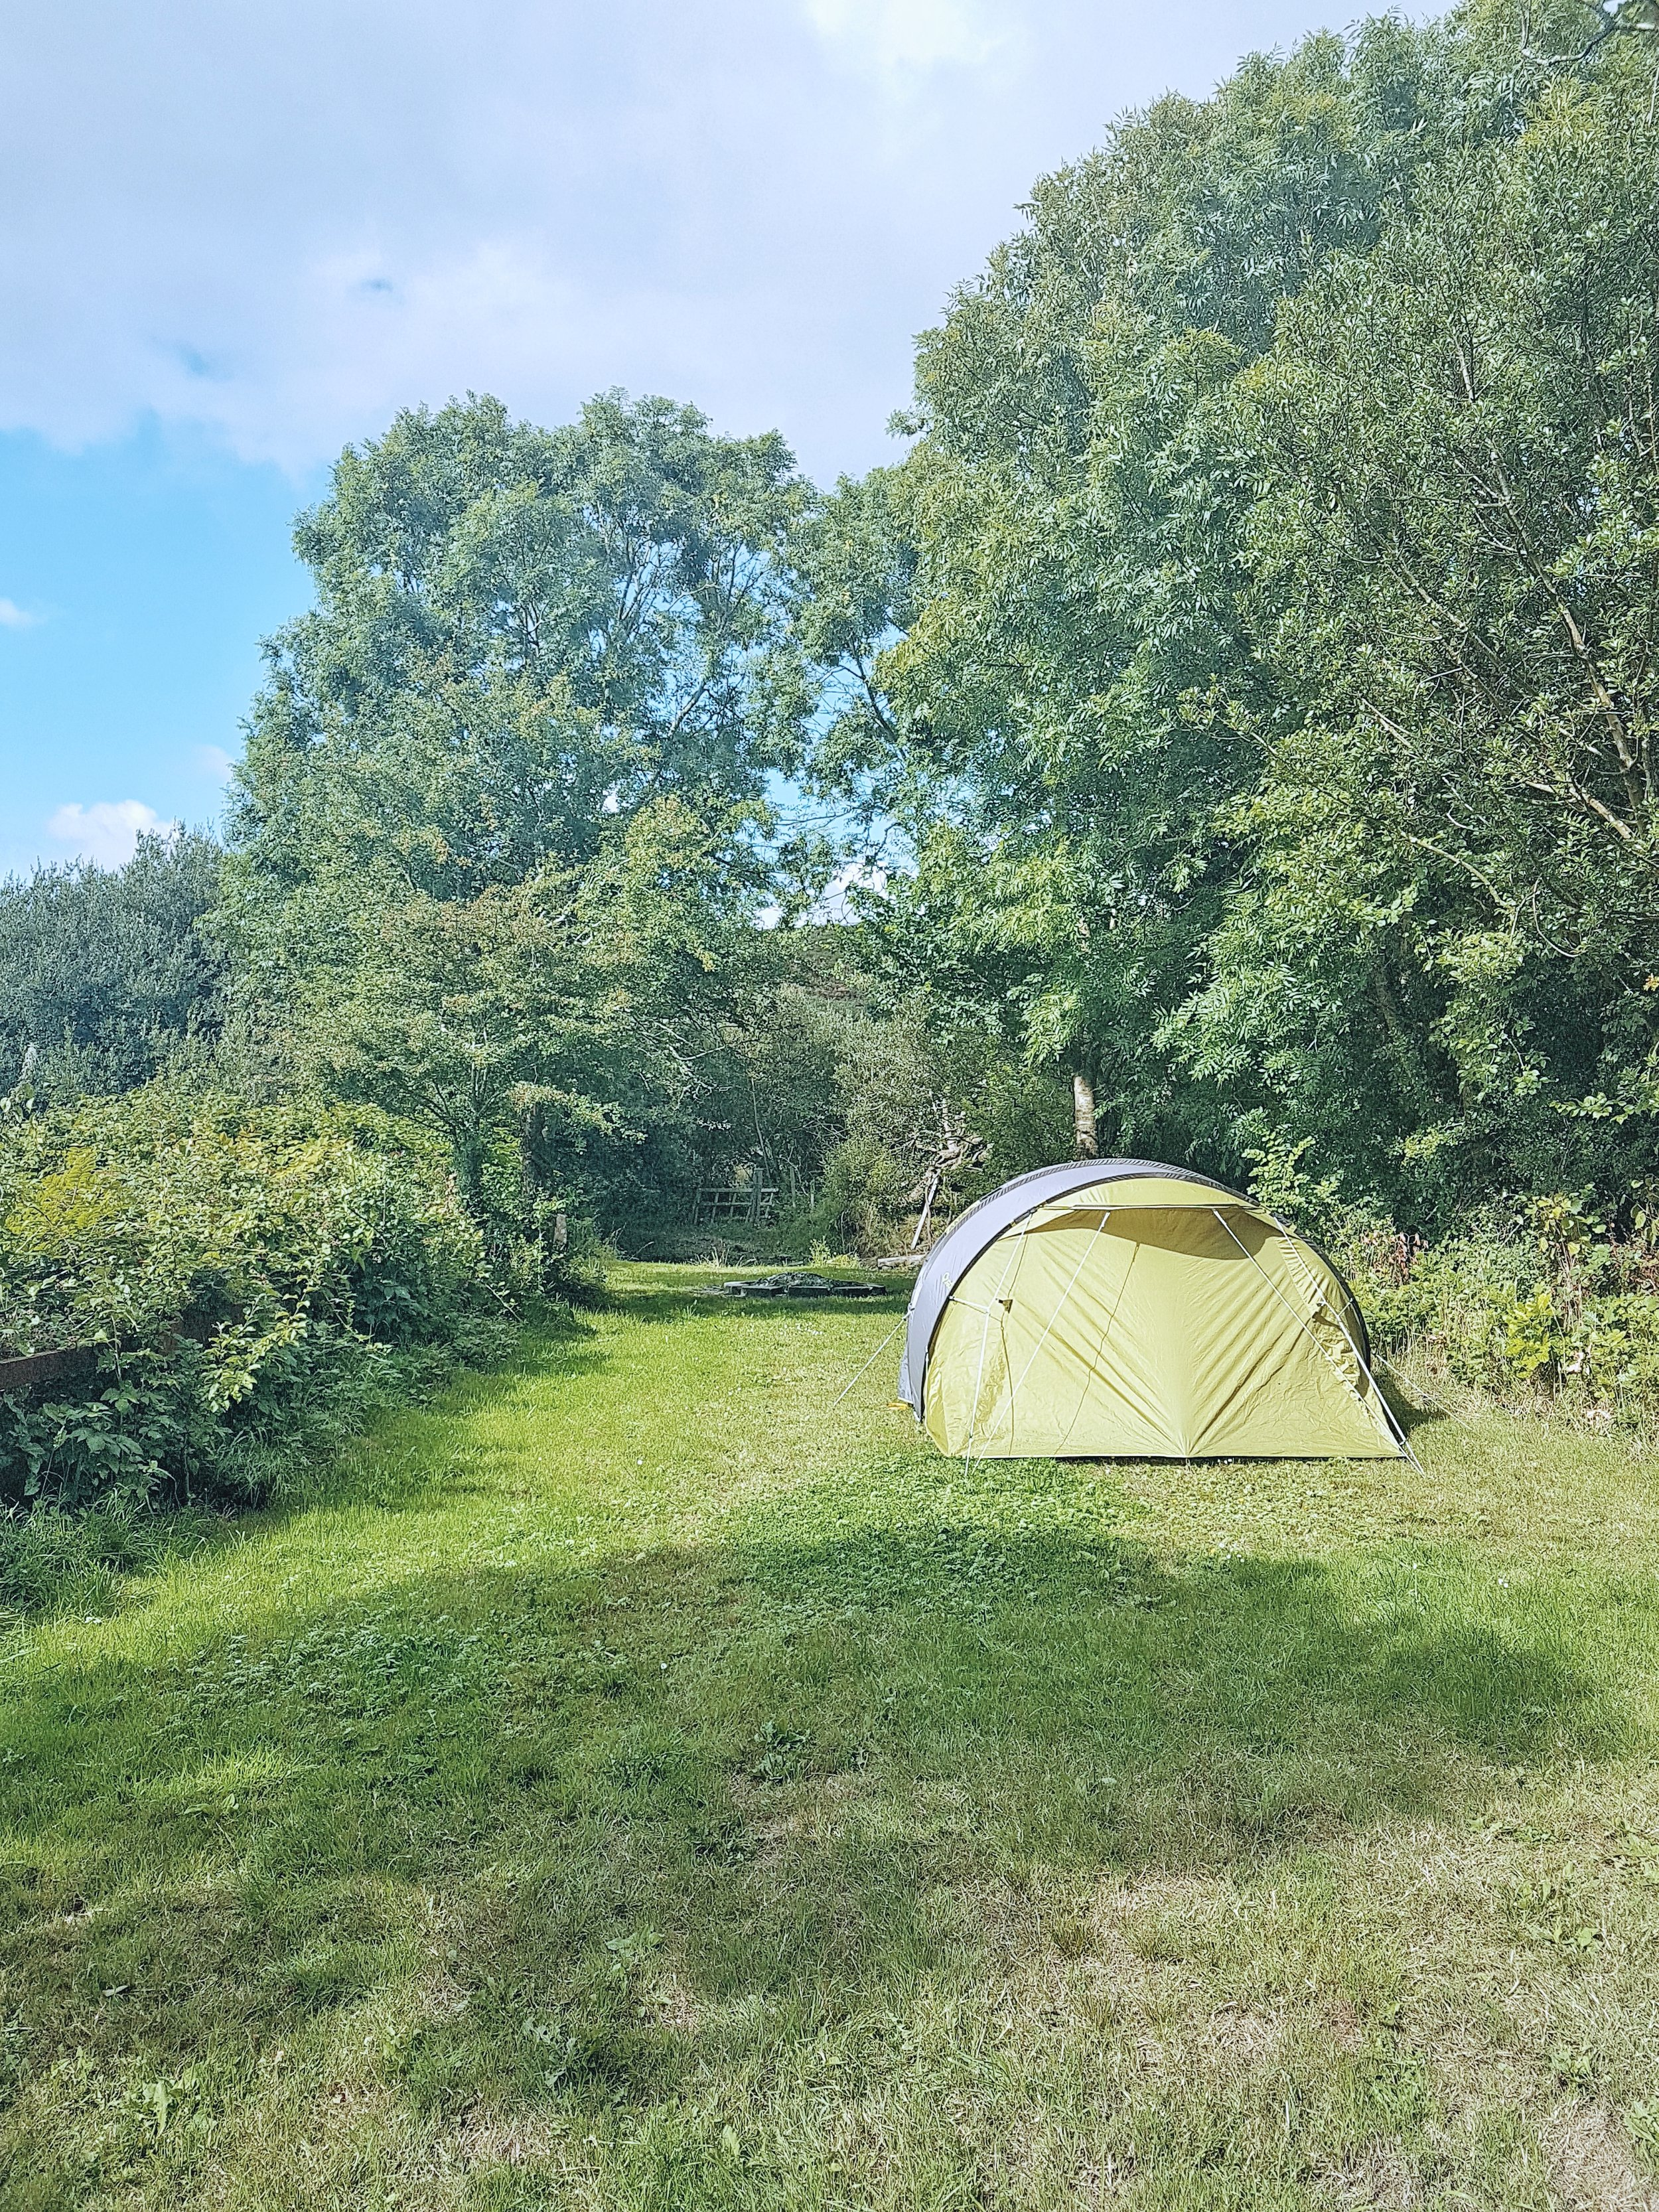 county cork. cork. ireland. irish. history. city. house sitting. old. travel. travel photography. travel photographer.  camping. tent. pitched tent. cork camping.jpg